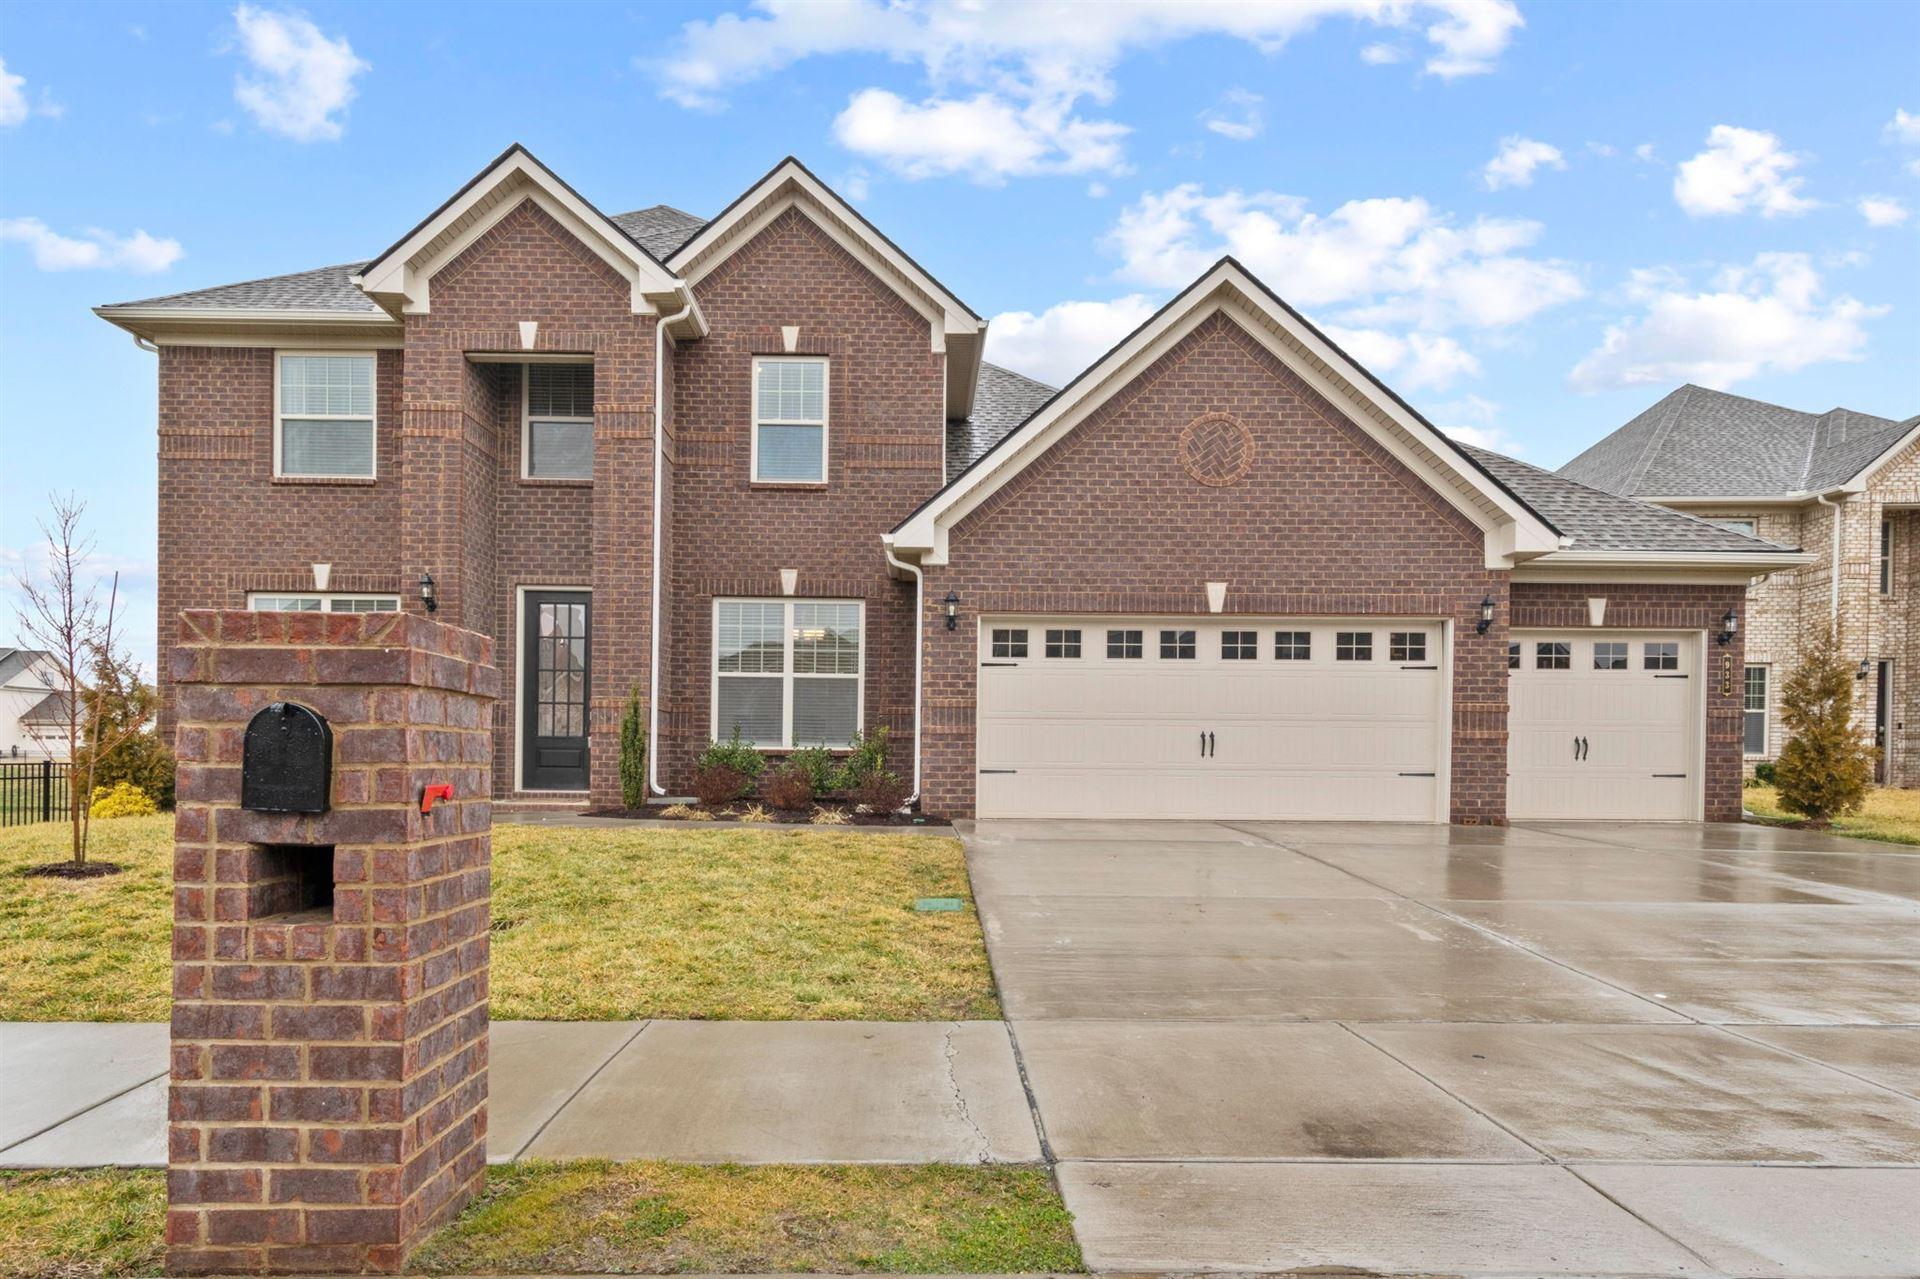 933 Covenant Blvd, Murfreesboro, TN 37128 - MLS#: 2229549